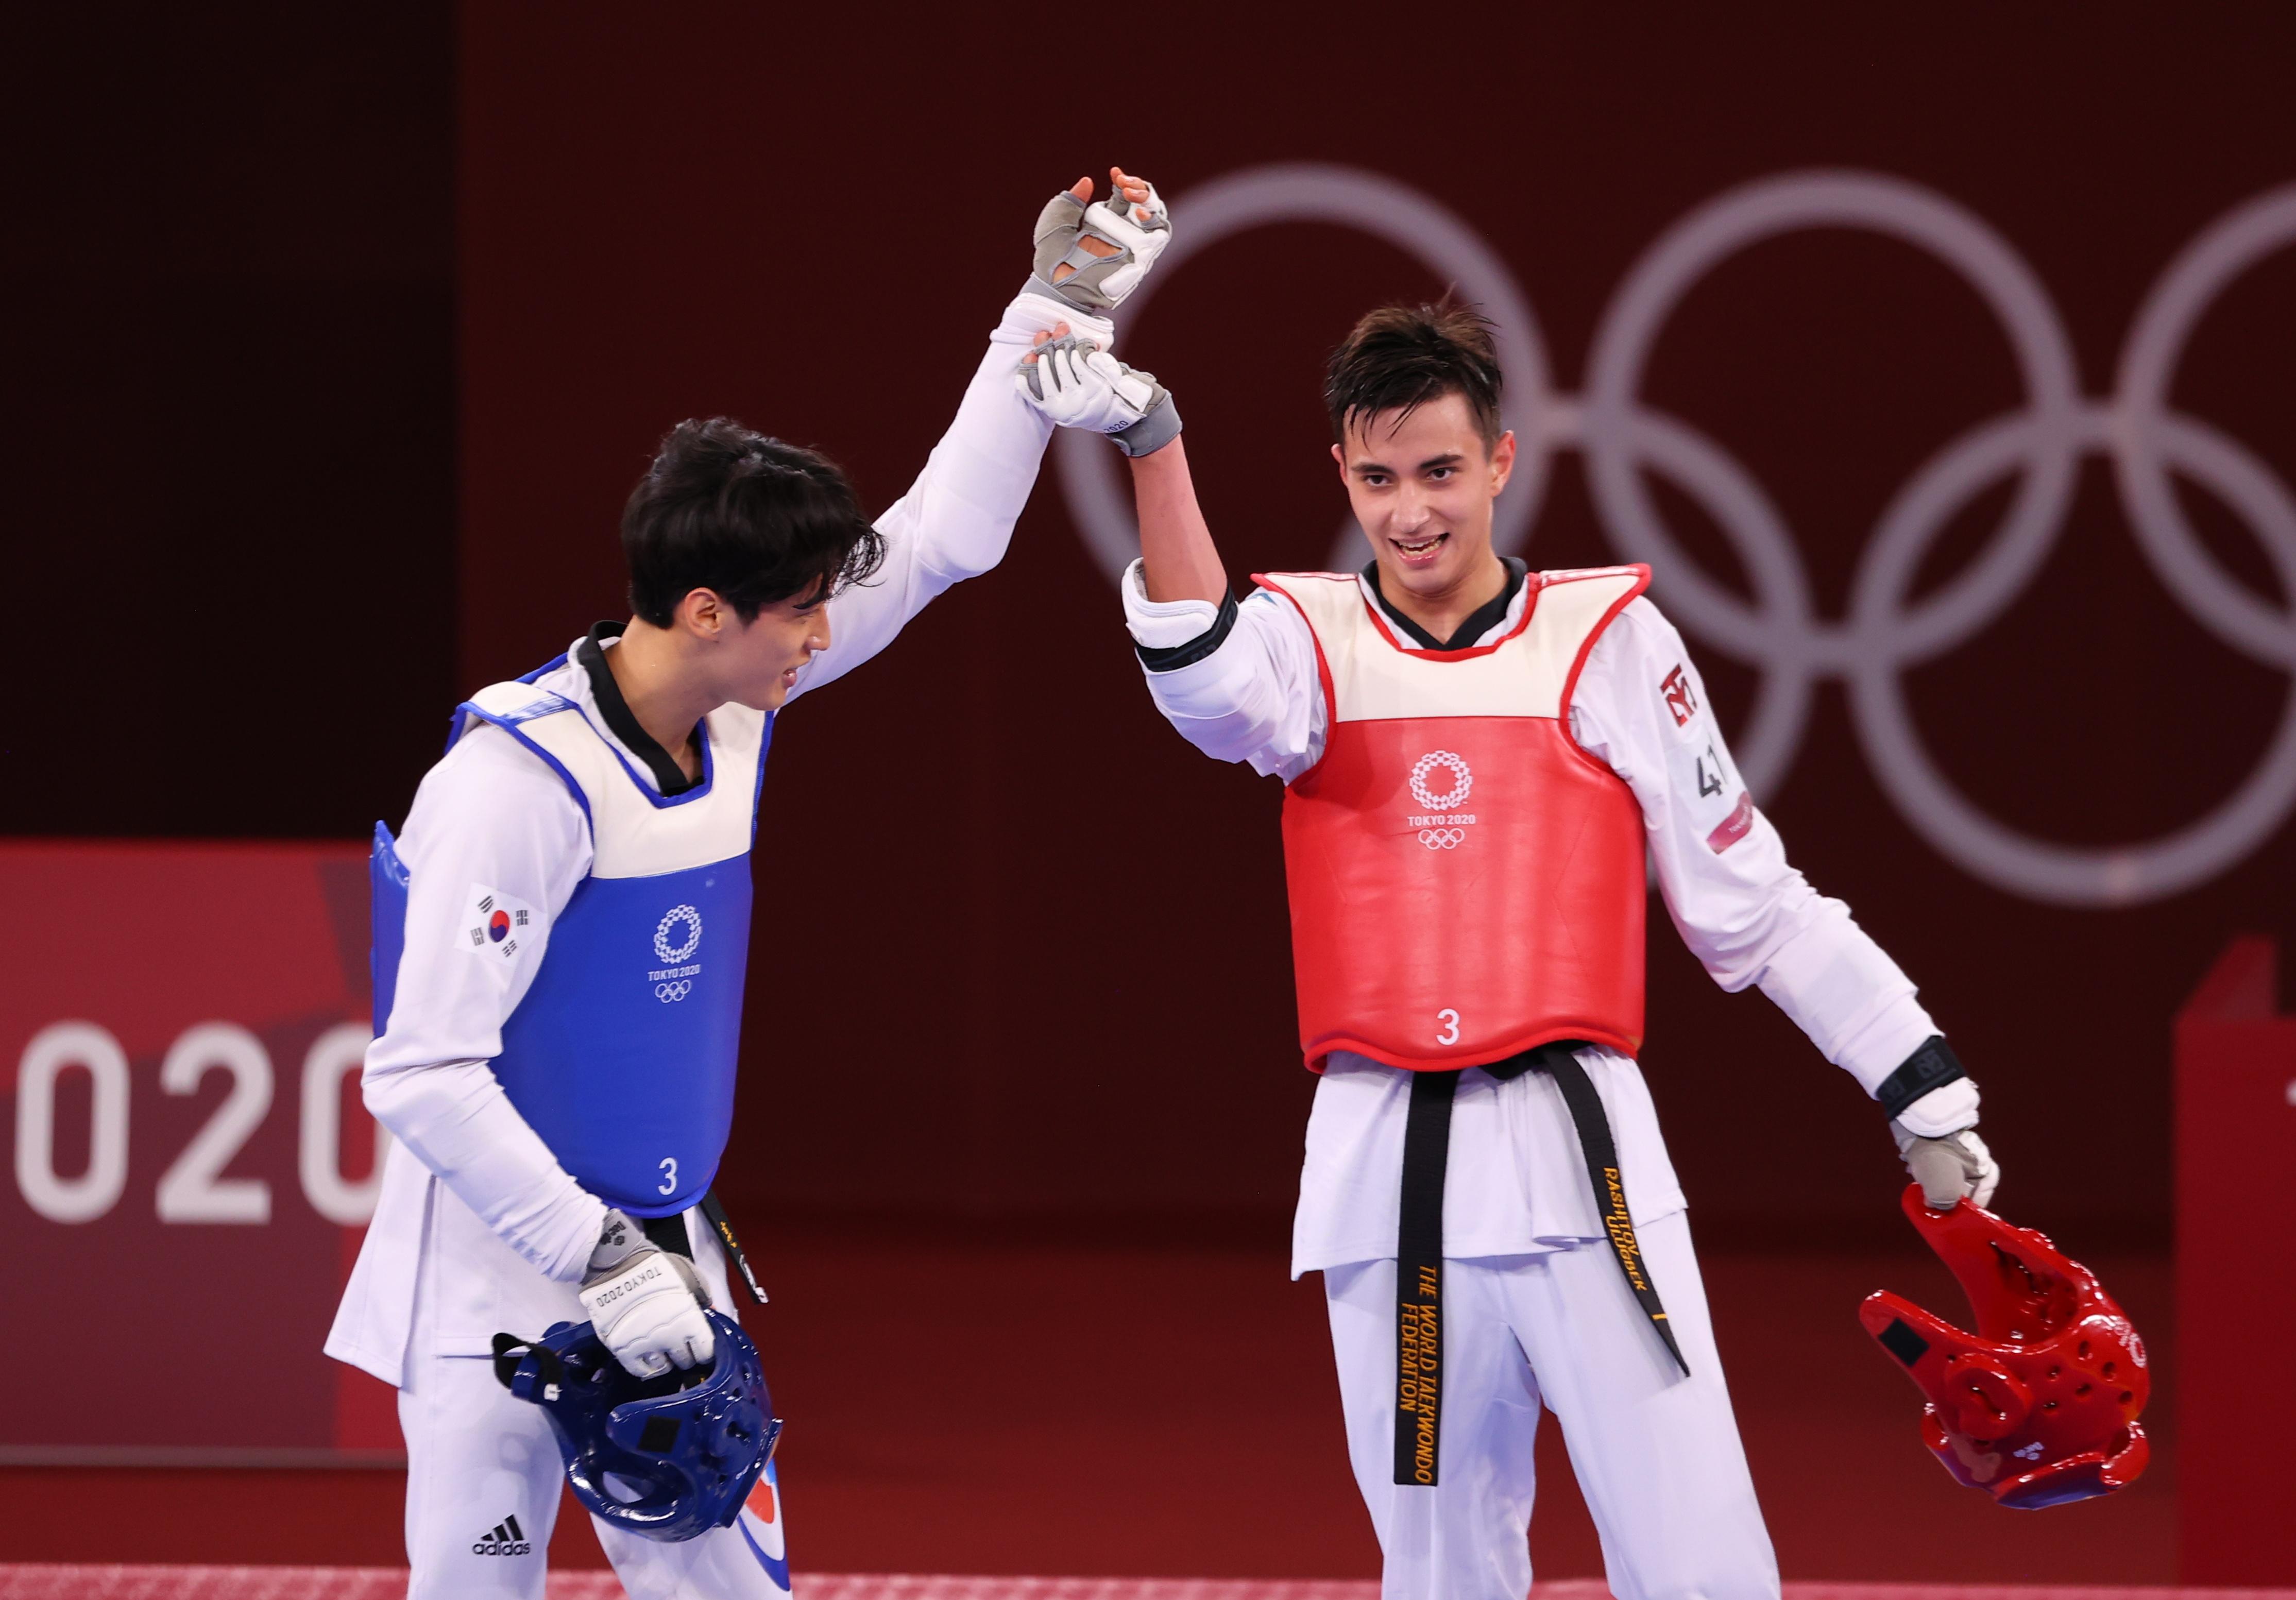 Tokyo 2020 Olympics - Taekwondo - Men's Featherweight 58-68kg - Last 16 - Makuhari Messe Hall A, Chiba, Japan - July 25, 2021. Ulugbek Rashitov of Uzbekistan and Lee Dae-Hoon of South Korea react after competing REUTERS/Murad Sezer